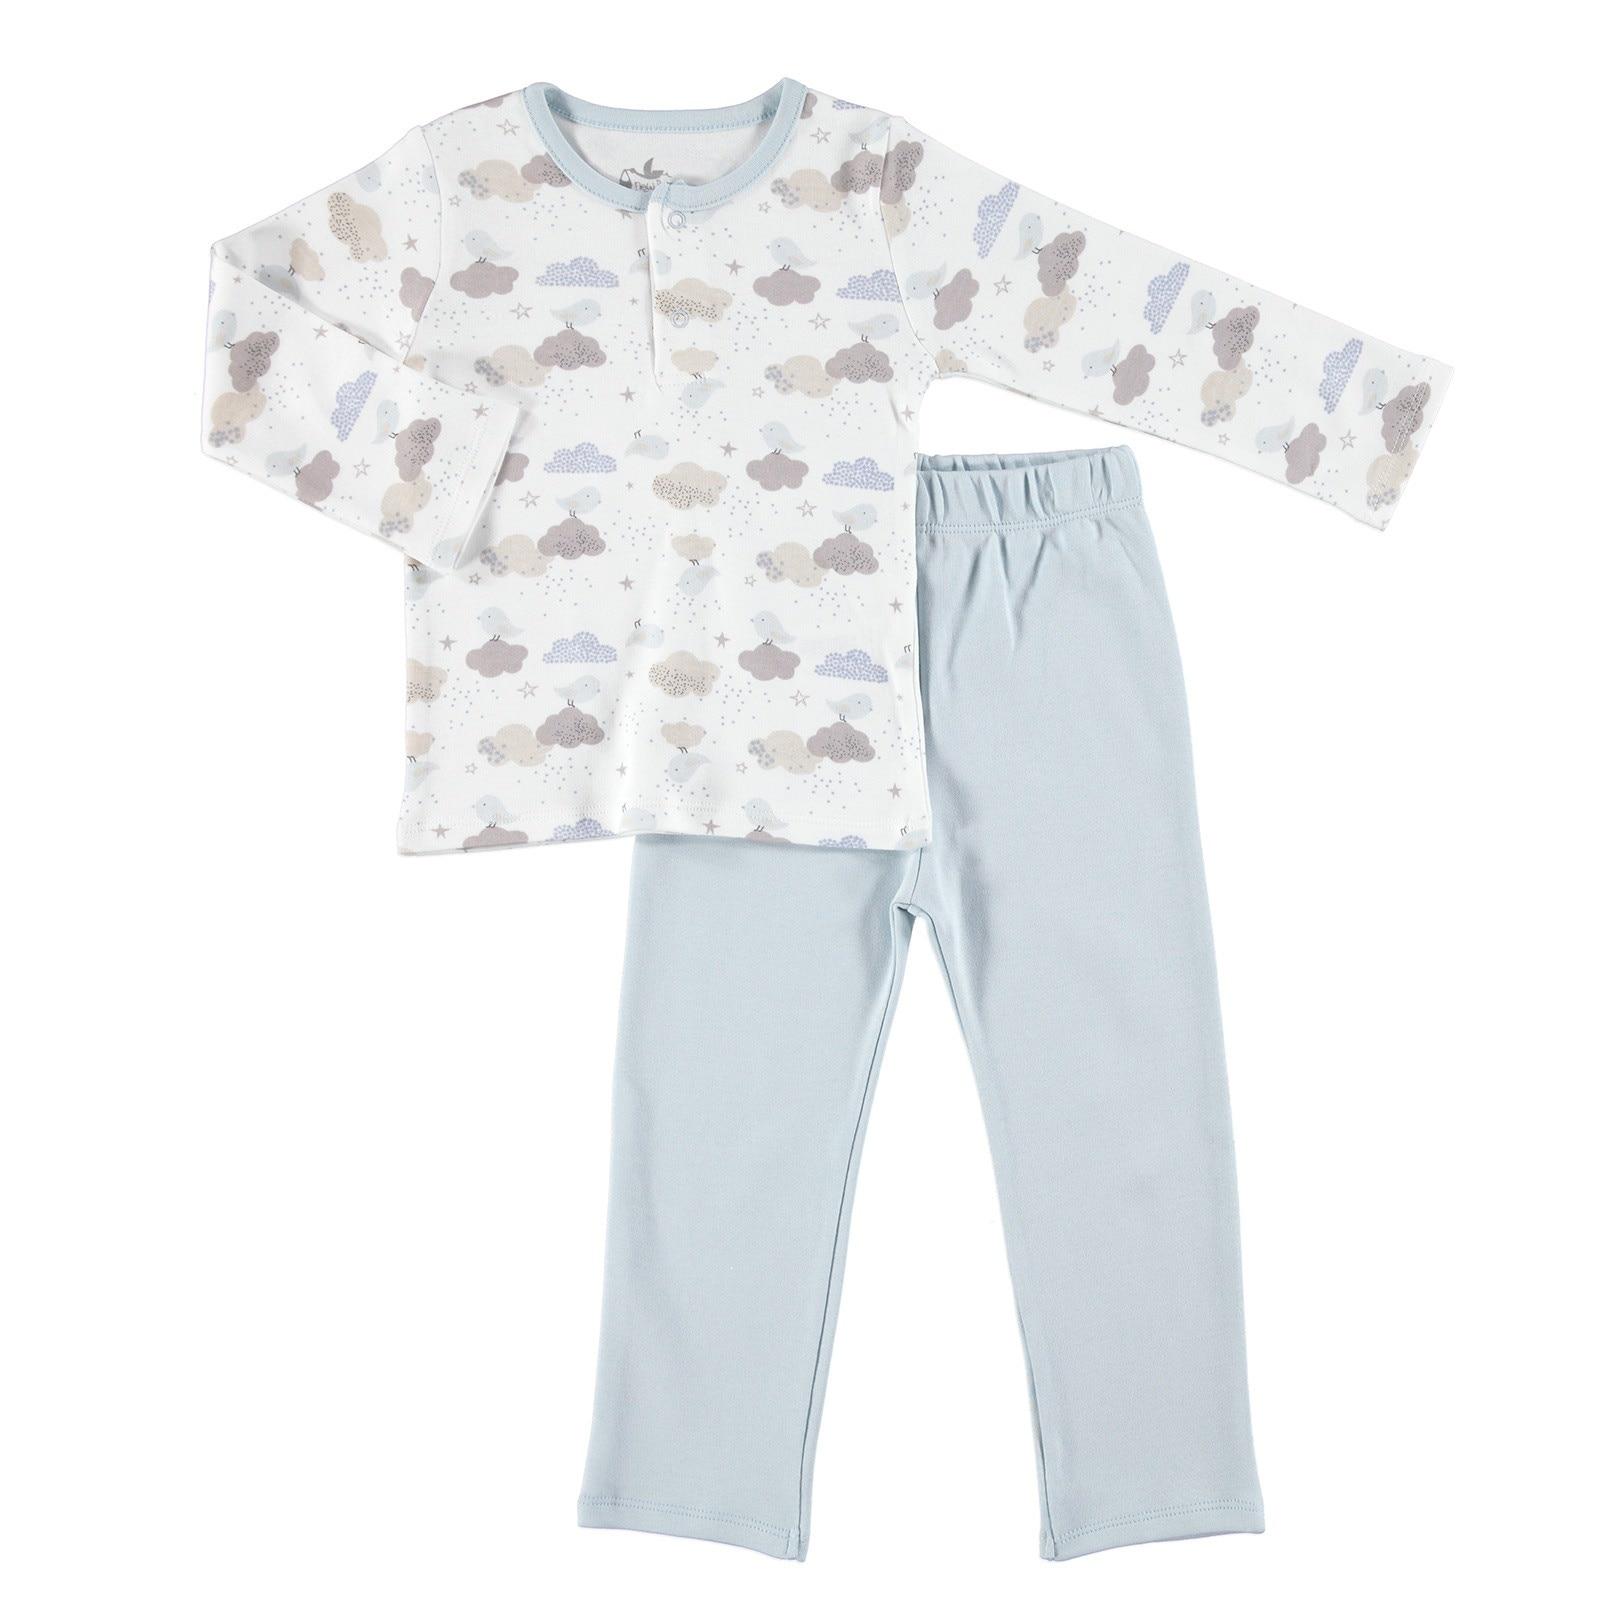 Ebebek Newborn Fashion Club Fun Winter Baby Sweatshirt Footless Pants